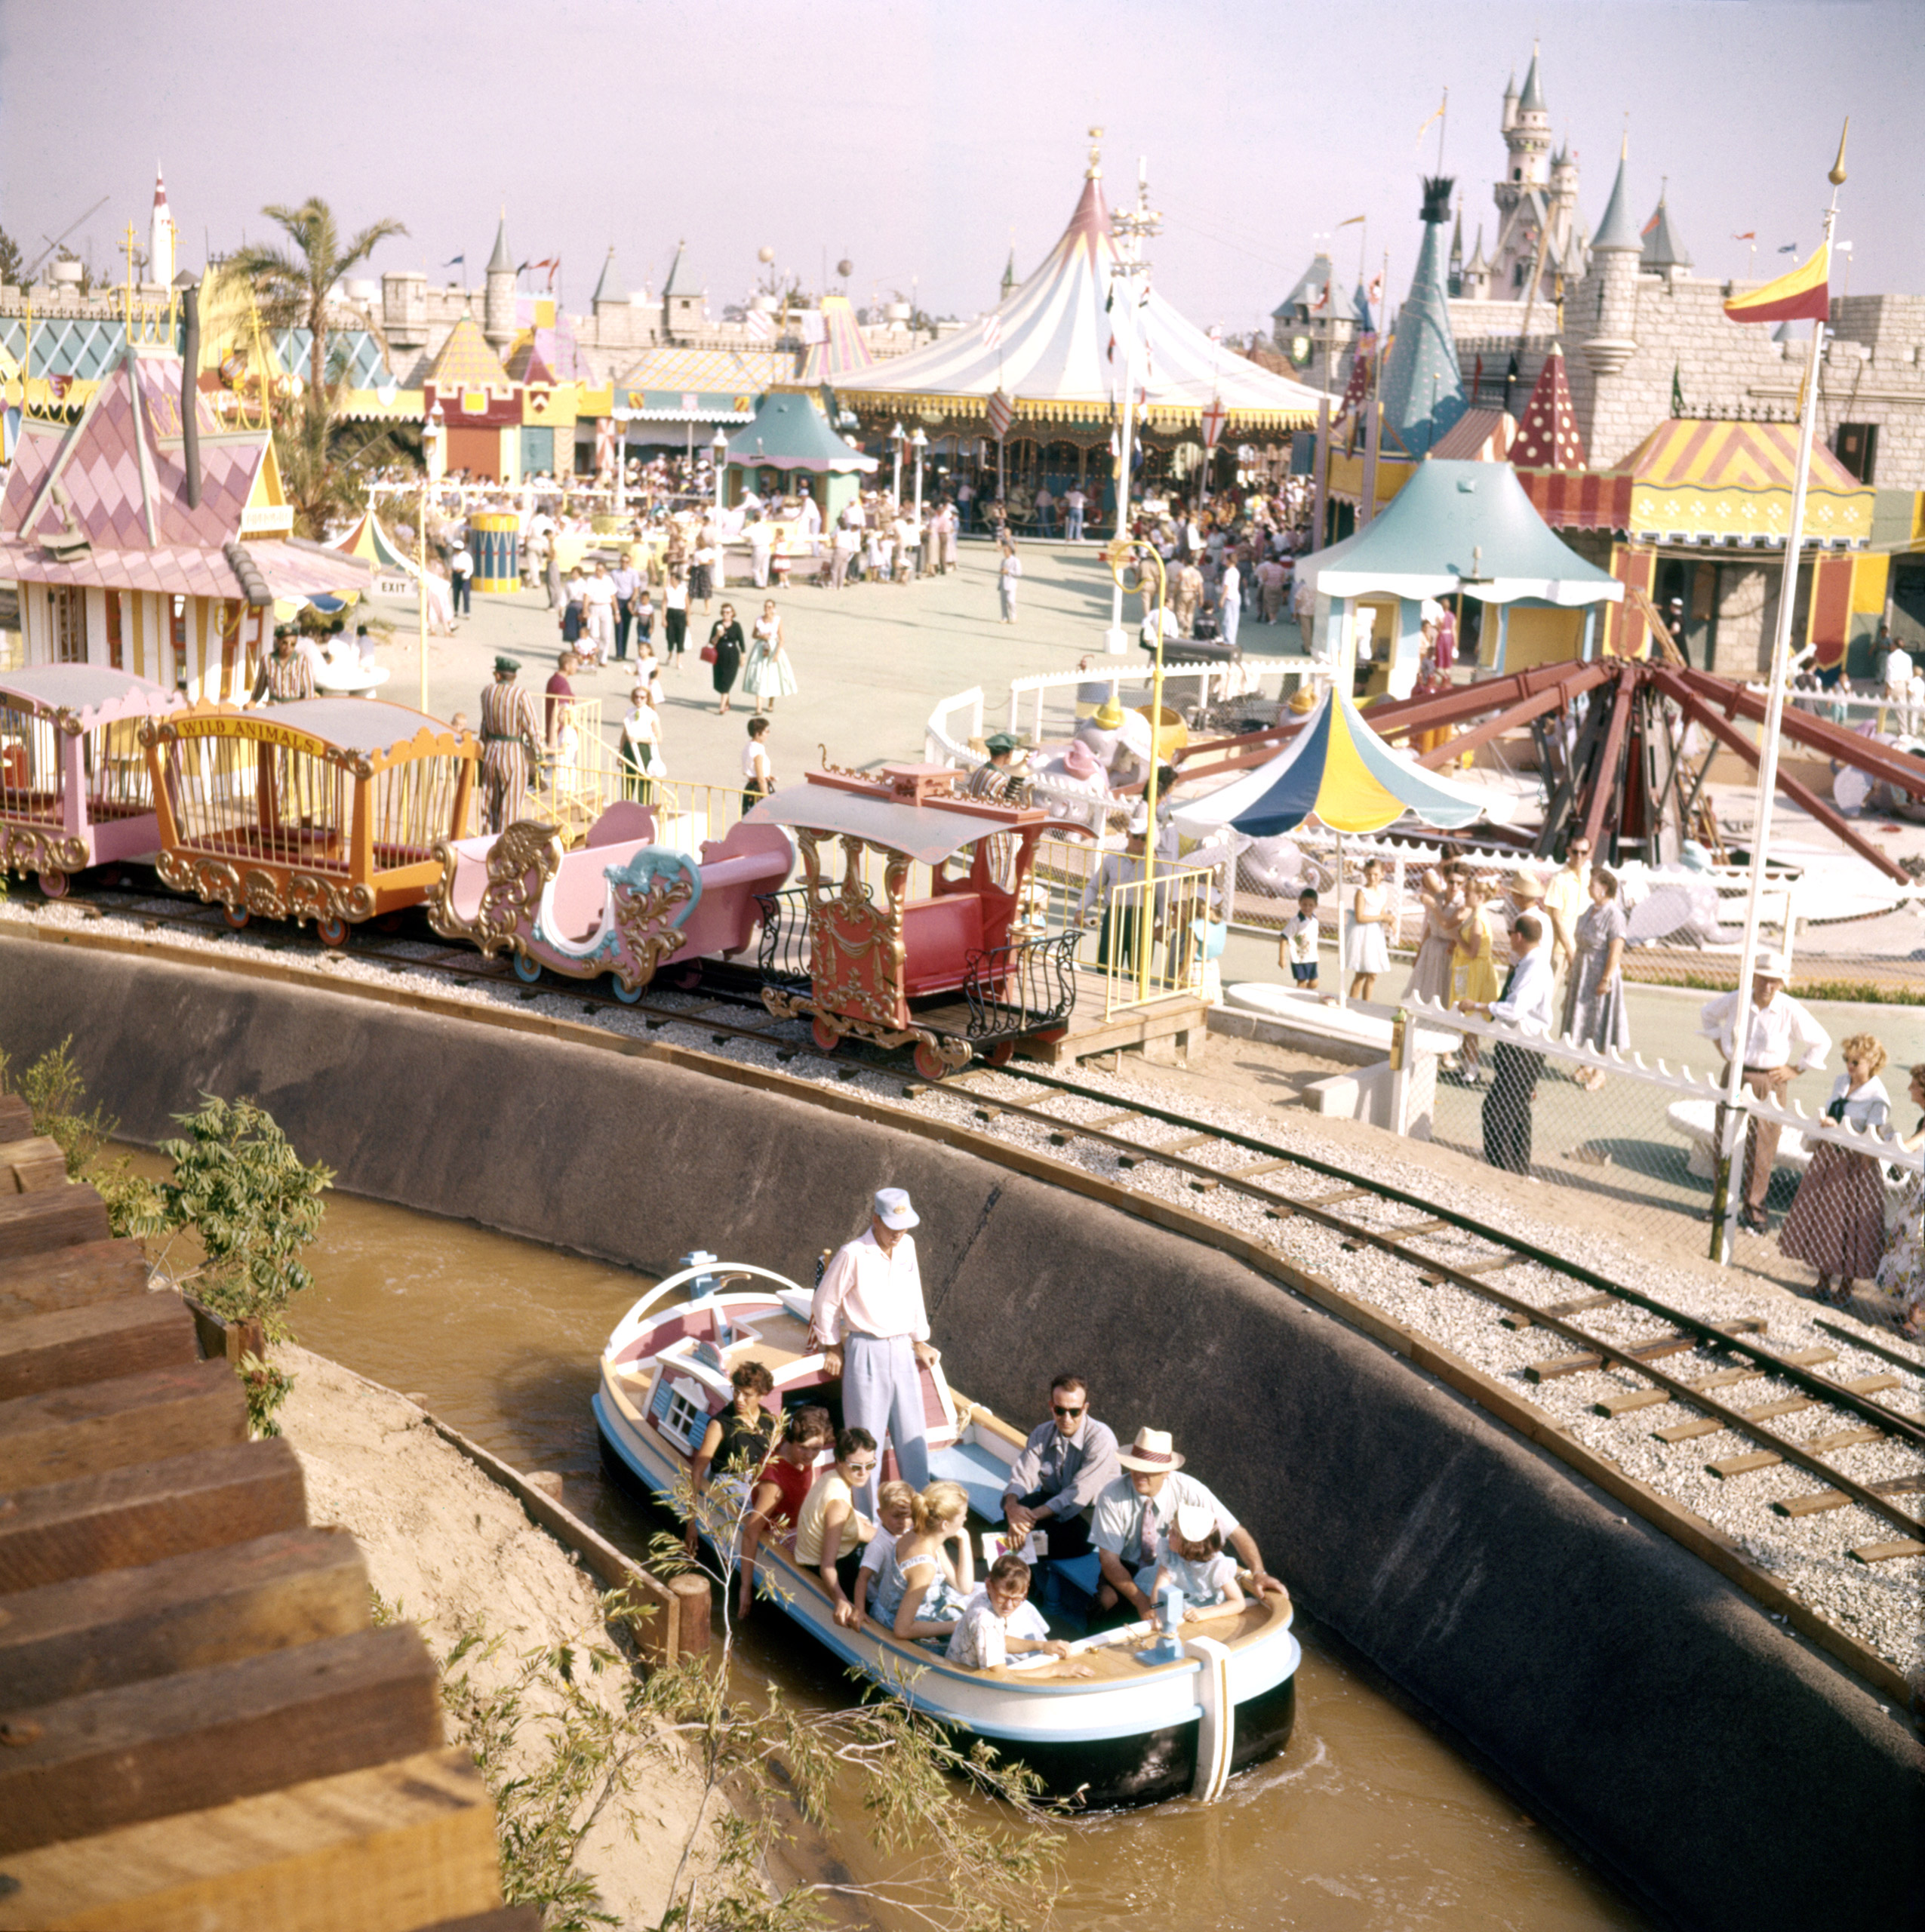 One of Disneyland's boat rides, Anaheim, California, 1955.